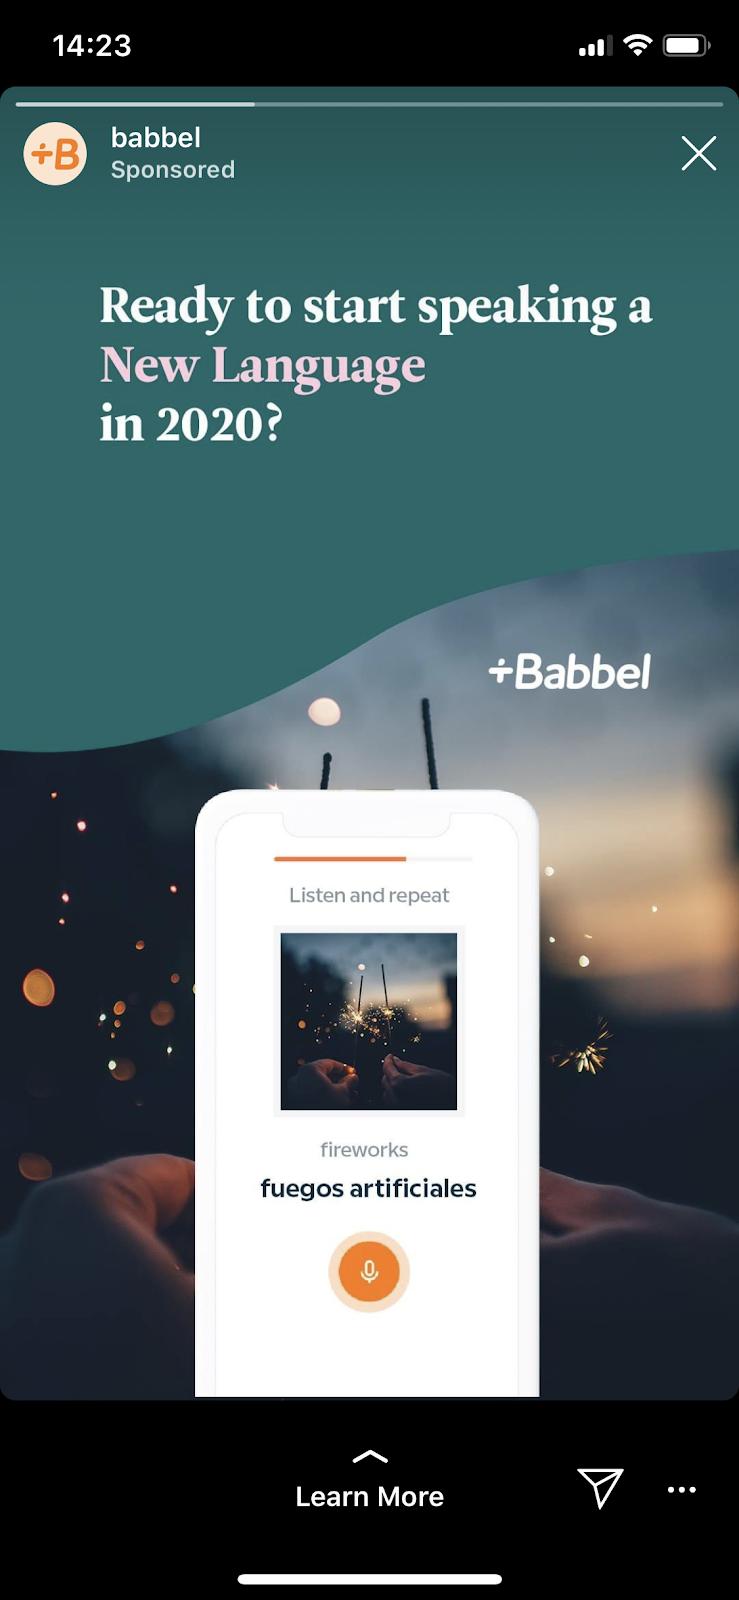 Babbel Instagram ad example